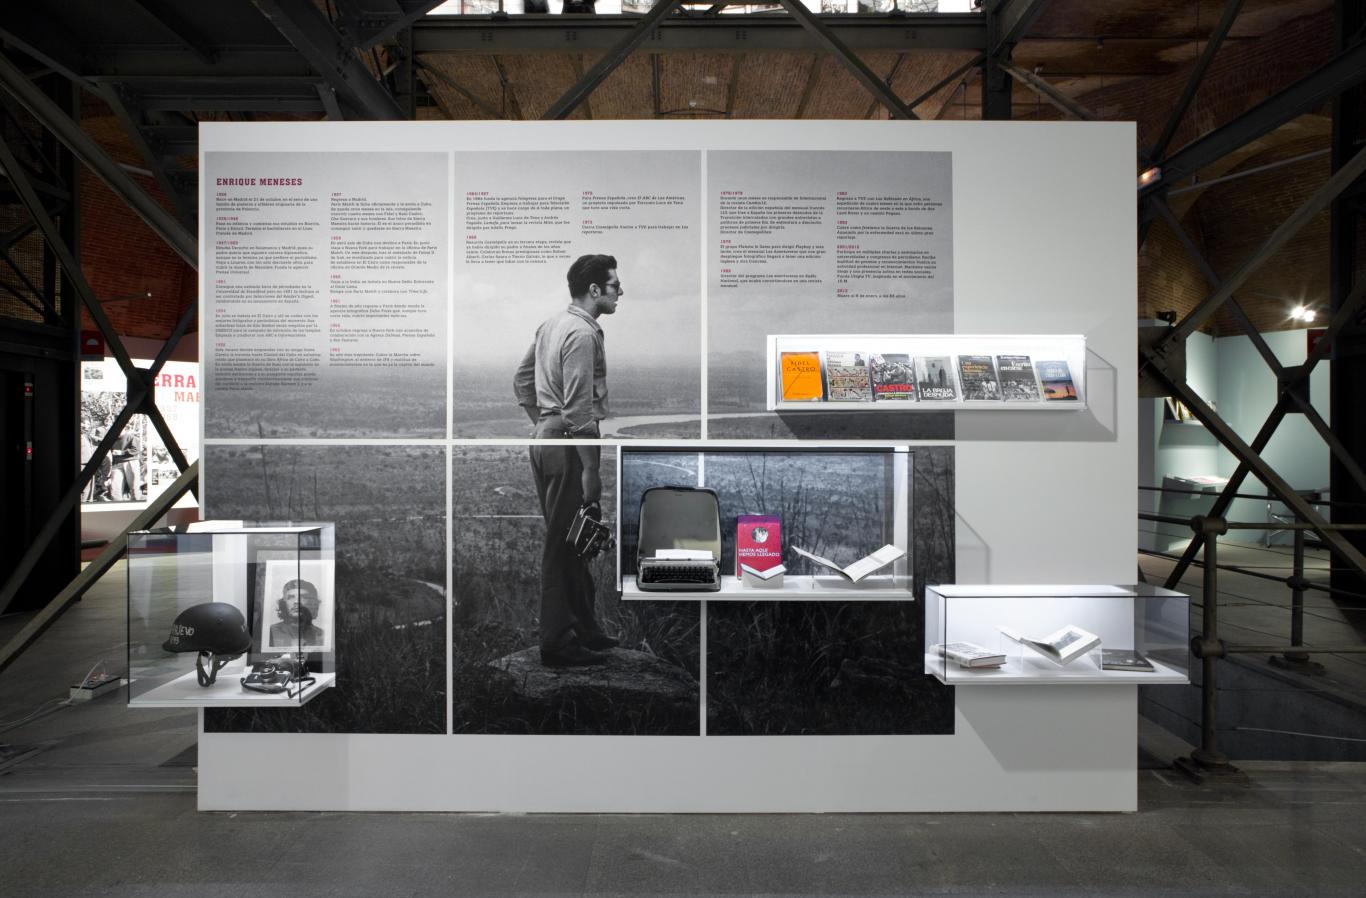 Panel con texto, libros e imagen del fotógrafo Enrique Meneses con su cámara en un paisaje exterior